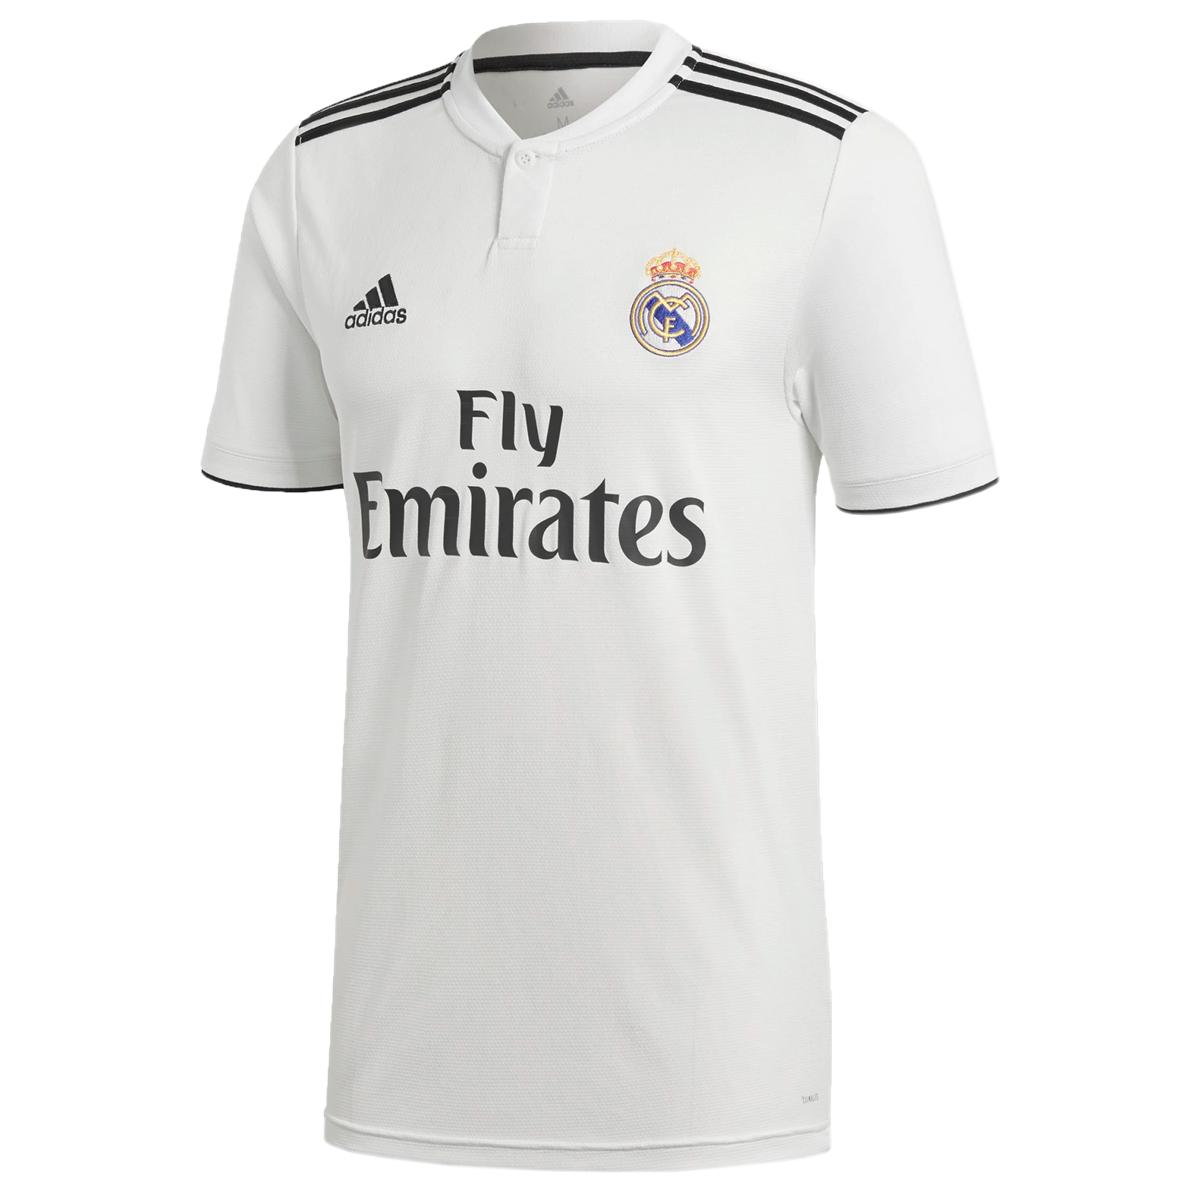 00c1e09dbaf CAMISA ADIDAS REAL MADRID 1 MASCULINA - Compre Agora